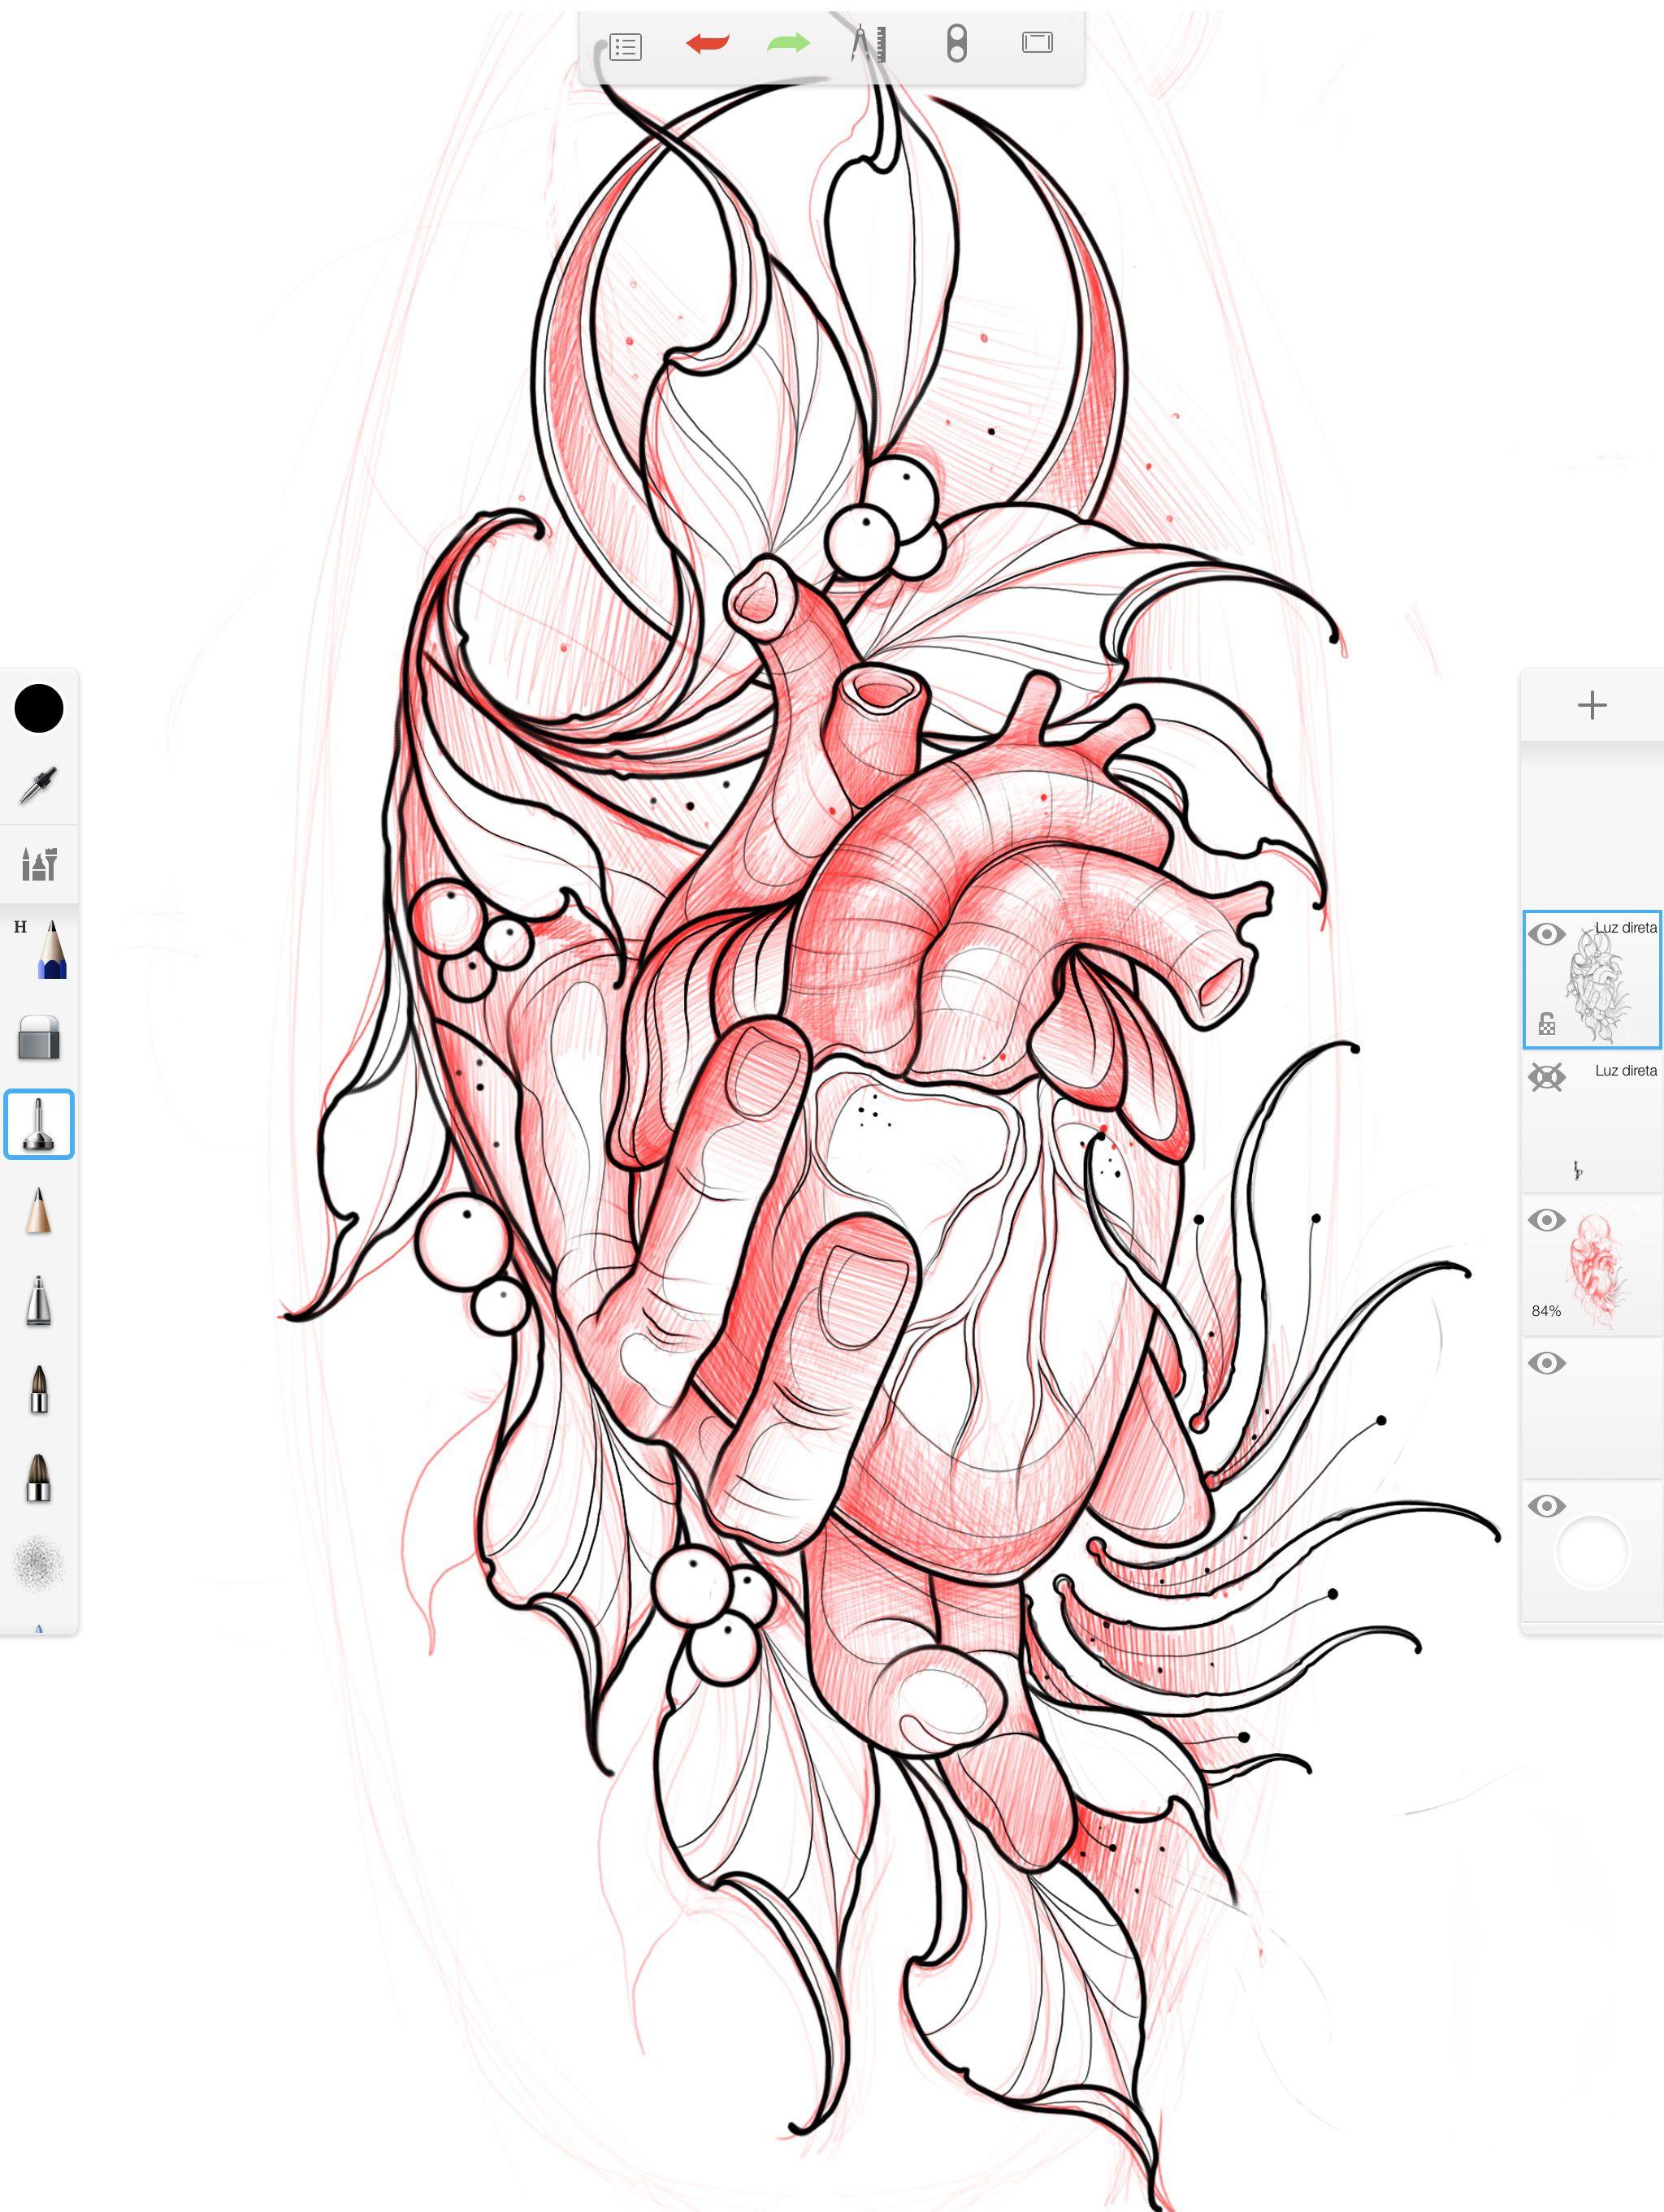 Digital To Skin Using Sketchbook Design Tattoos Nvrh Pre Dimmer Switch Wiringdimmerswitchsketch1jpg